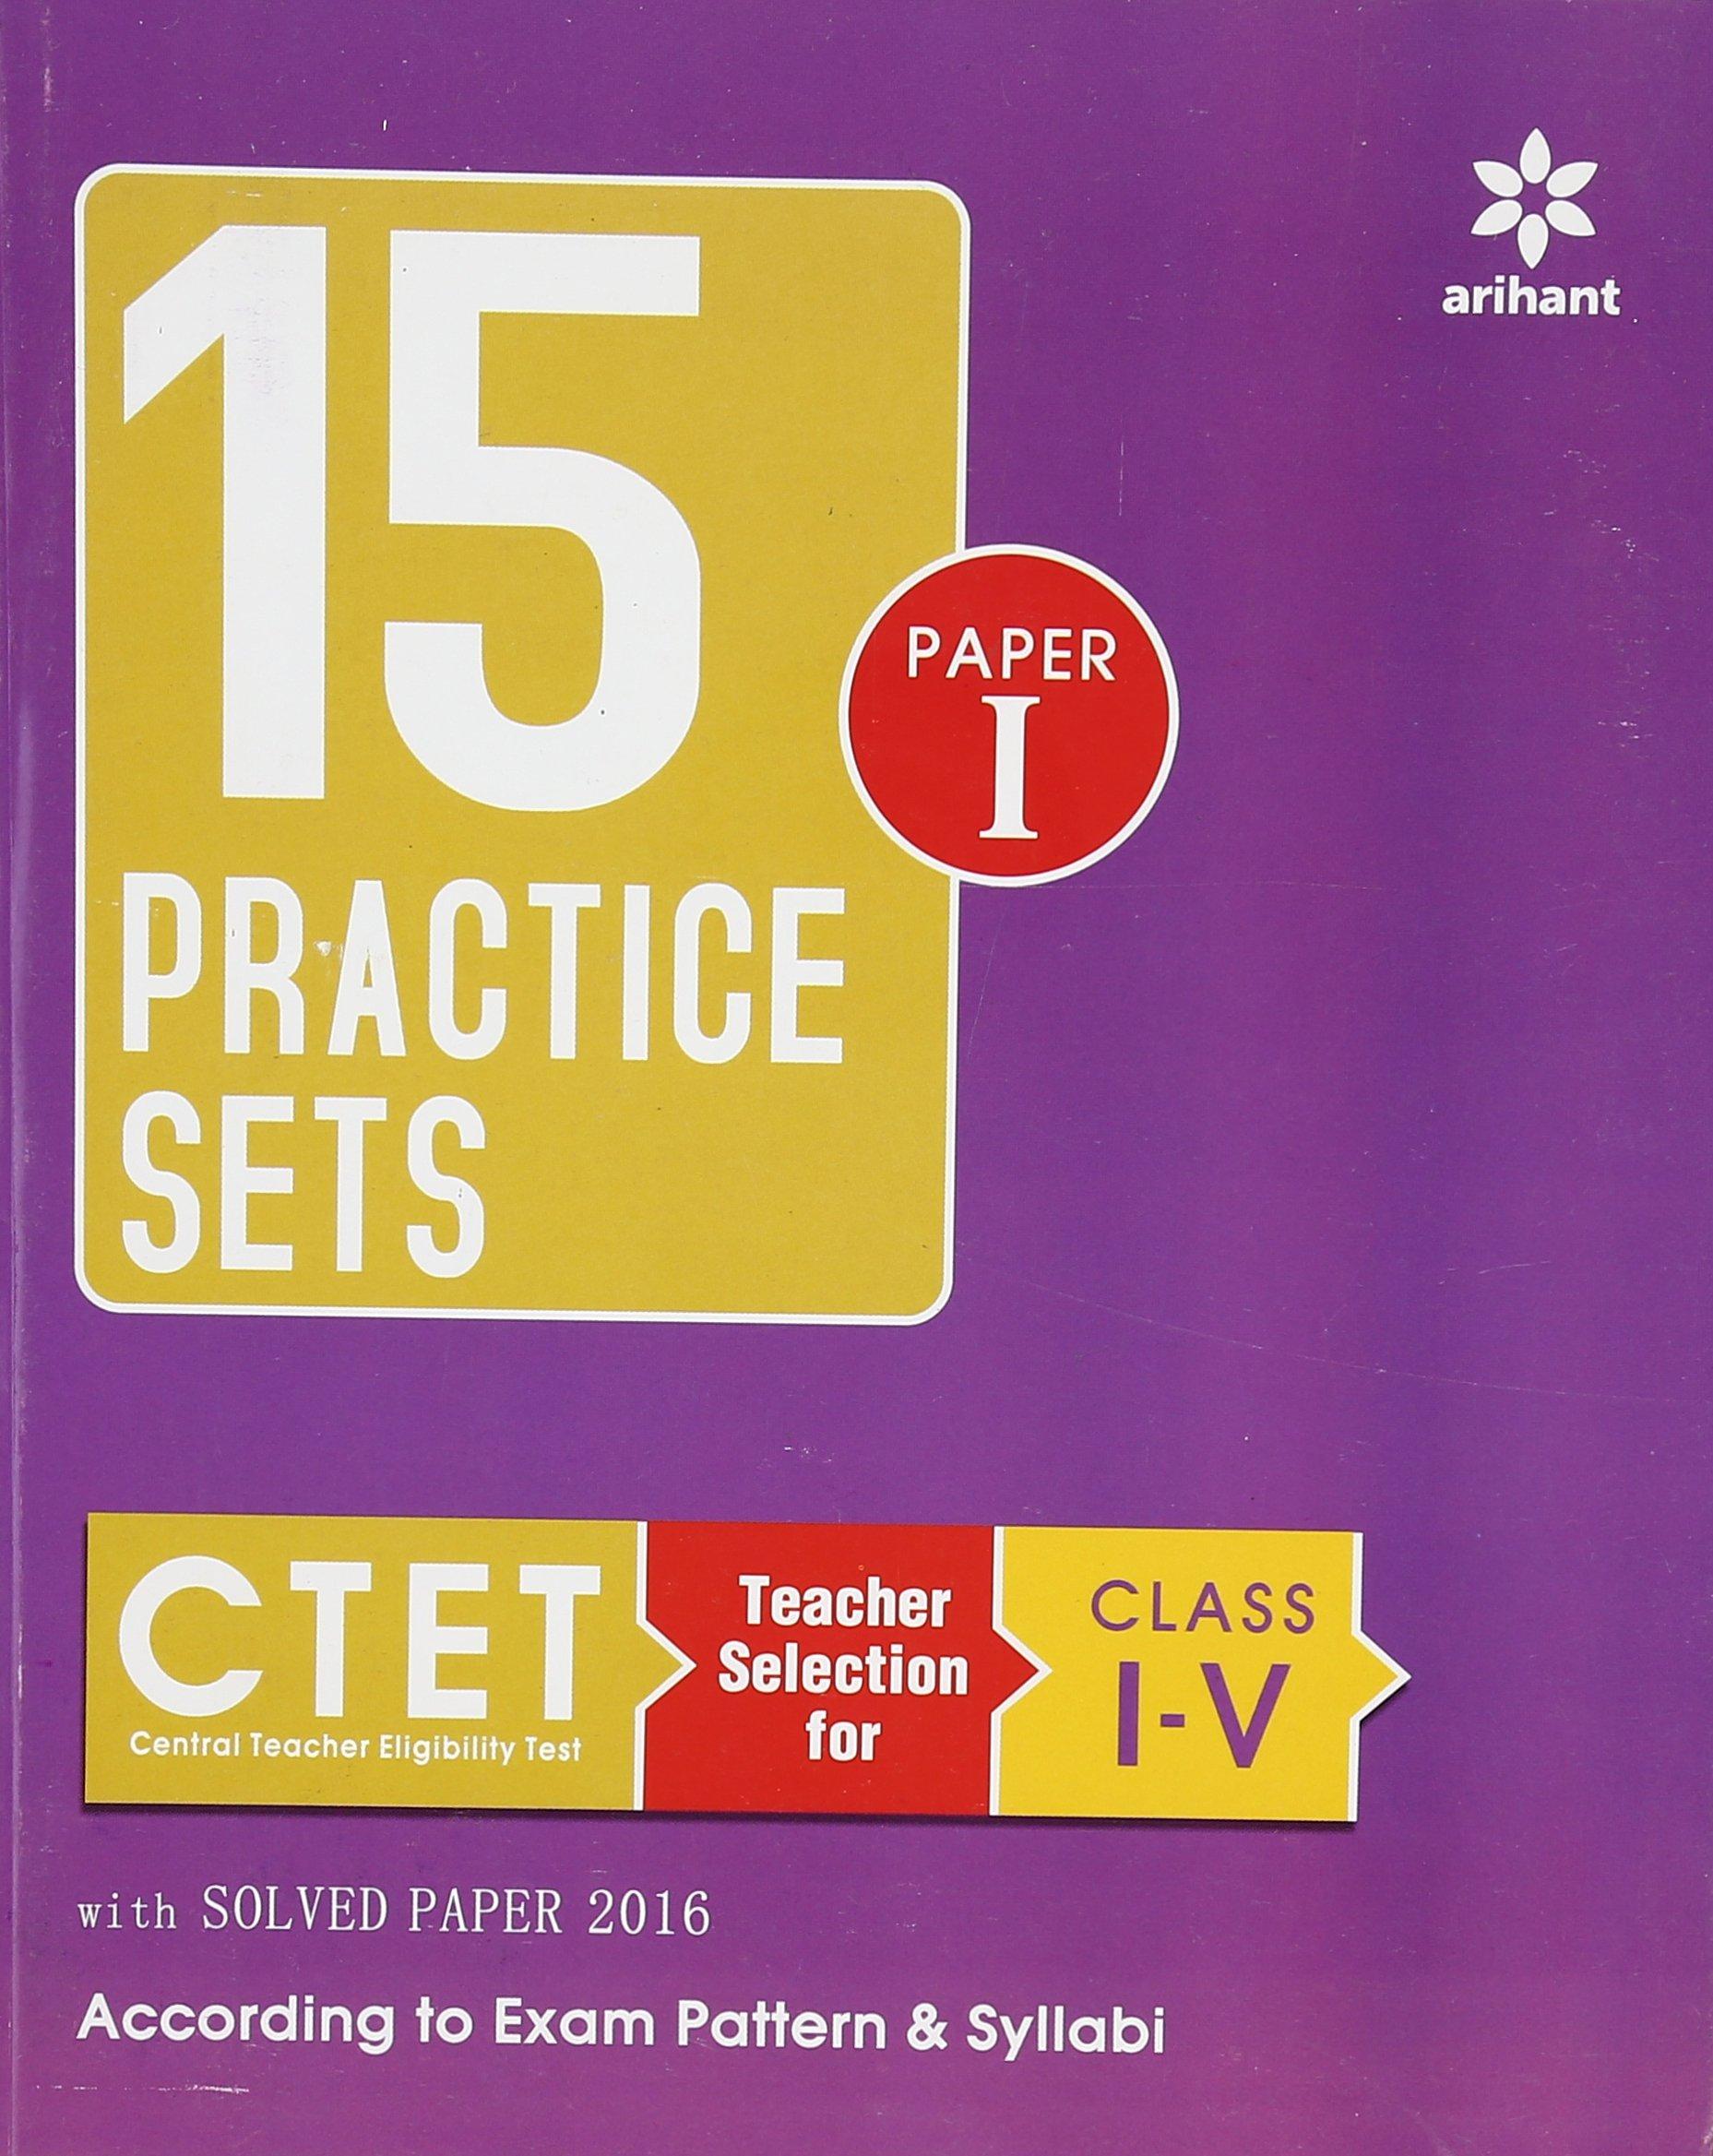 15 Practice Sets CTET Central Teacher Eligibility Test Paper-1 Teacher Selection for Class (I-V) pdf